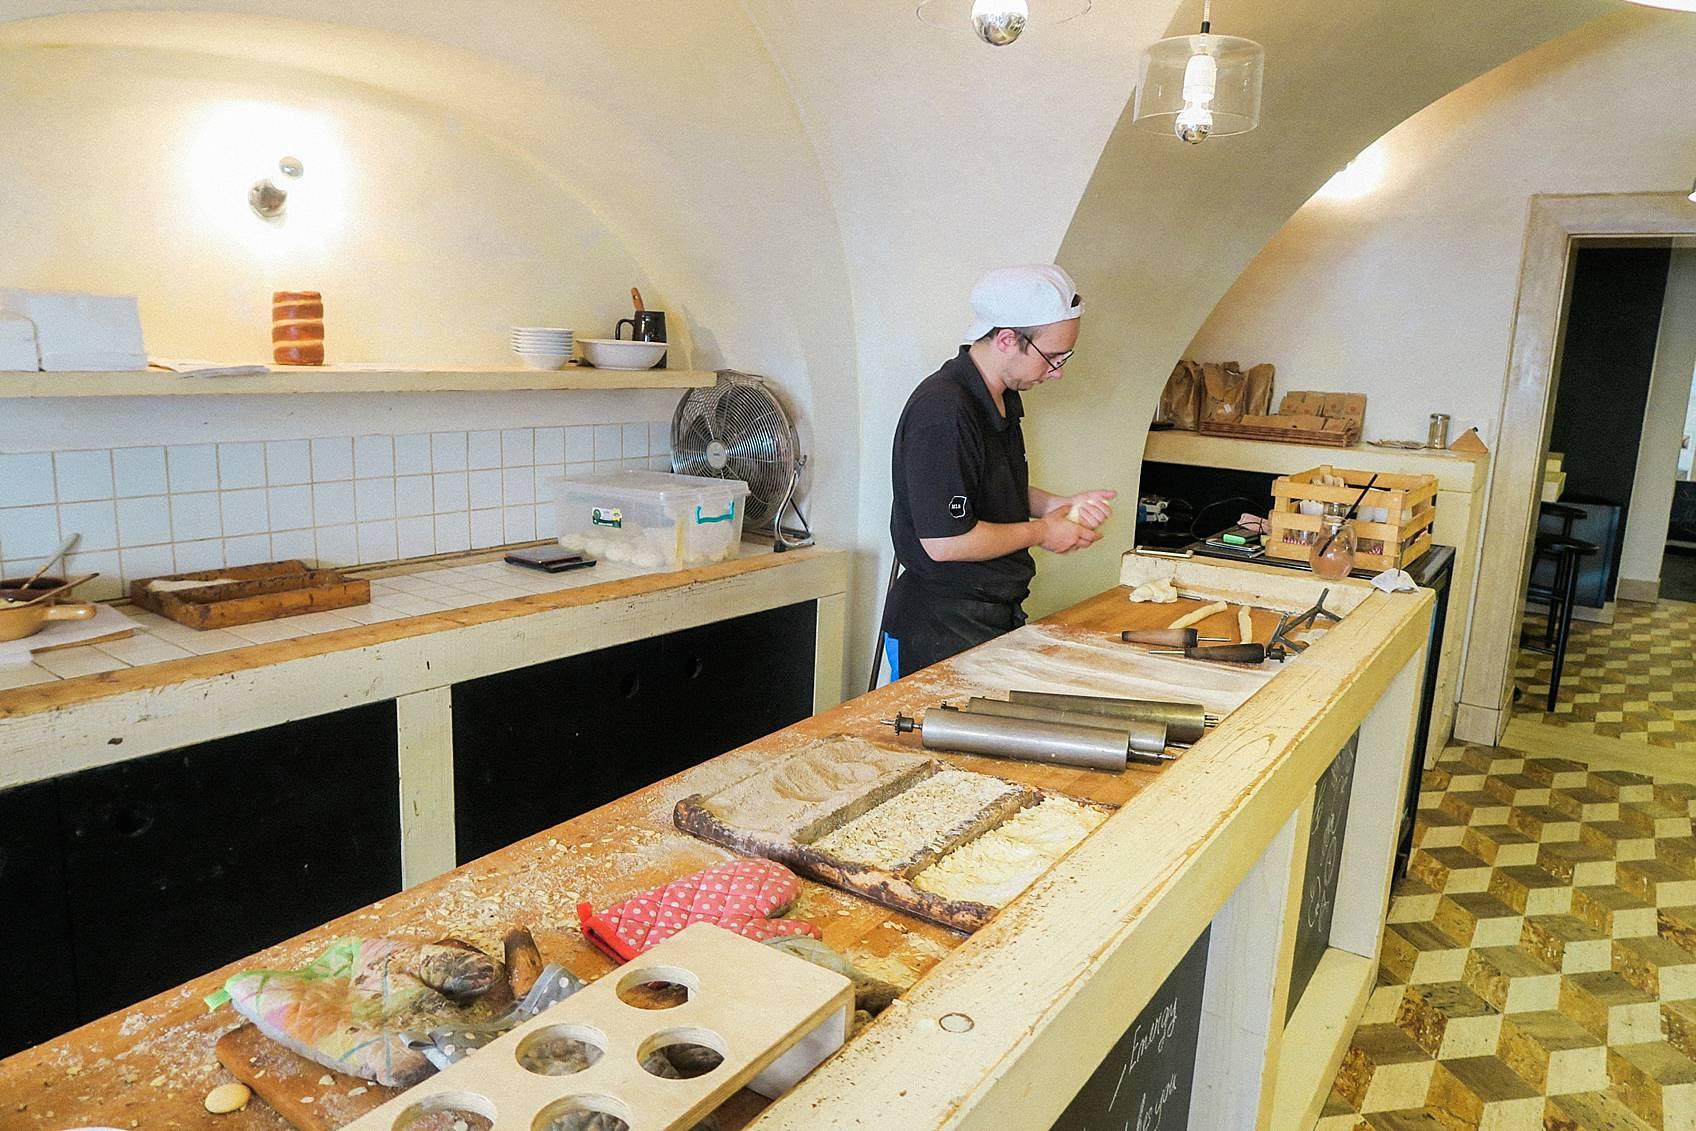 Trdelnik in Prague making